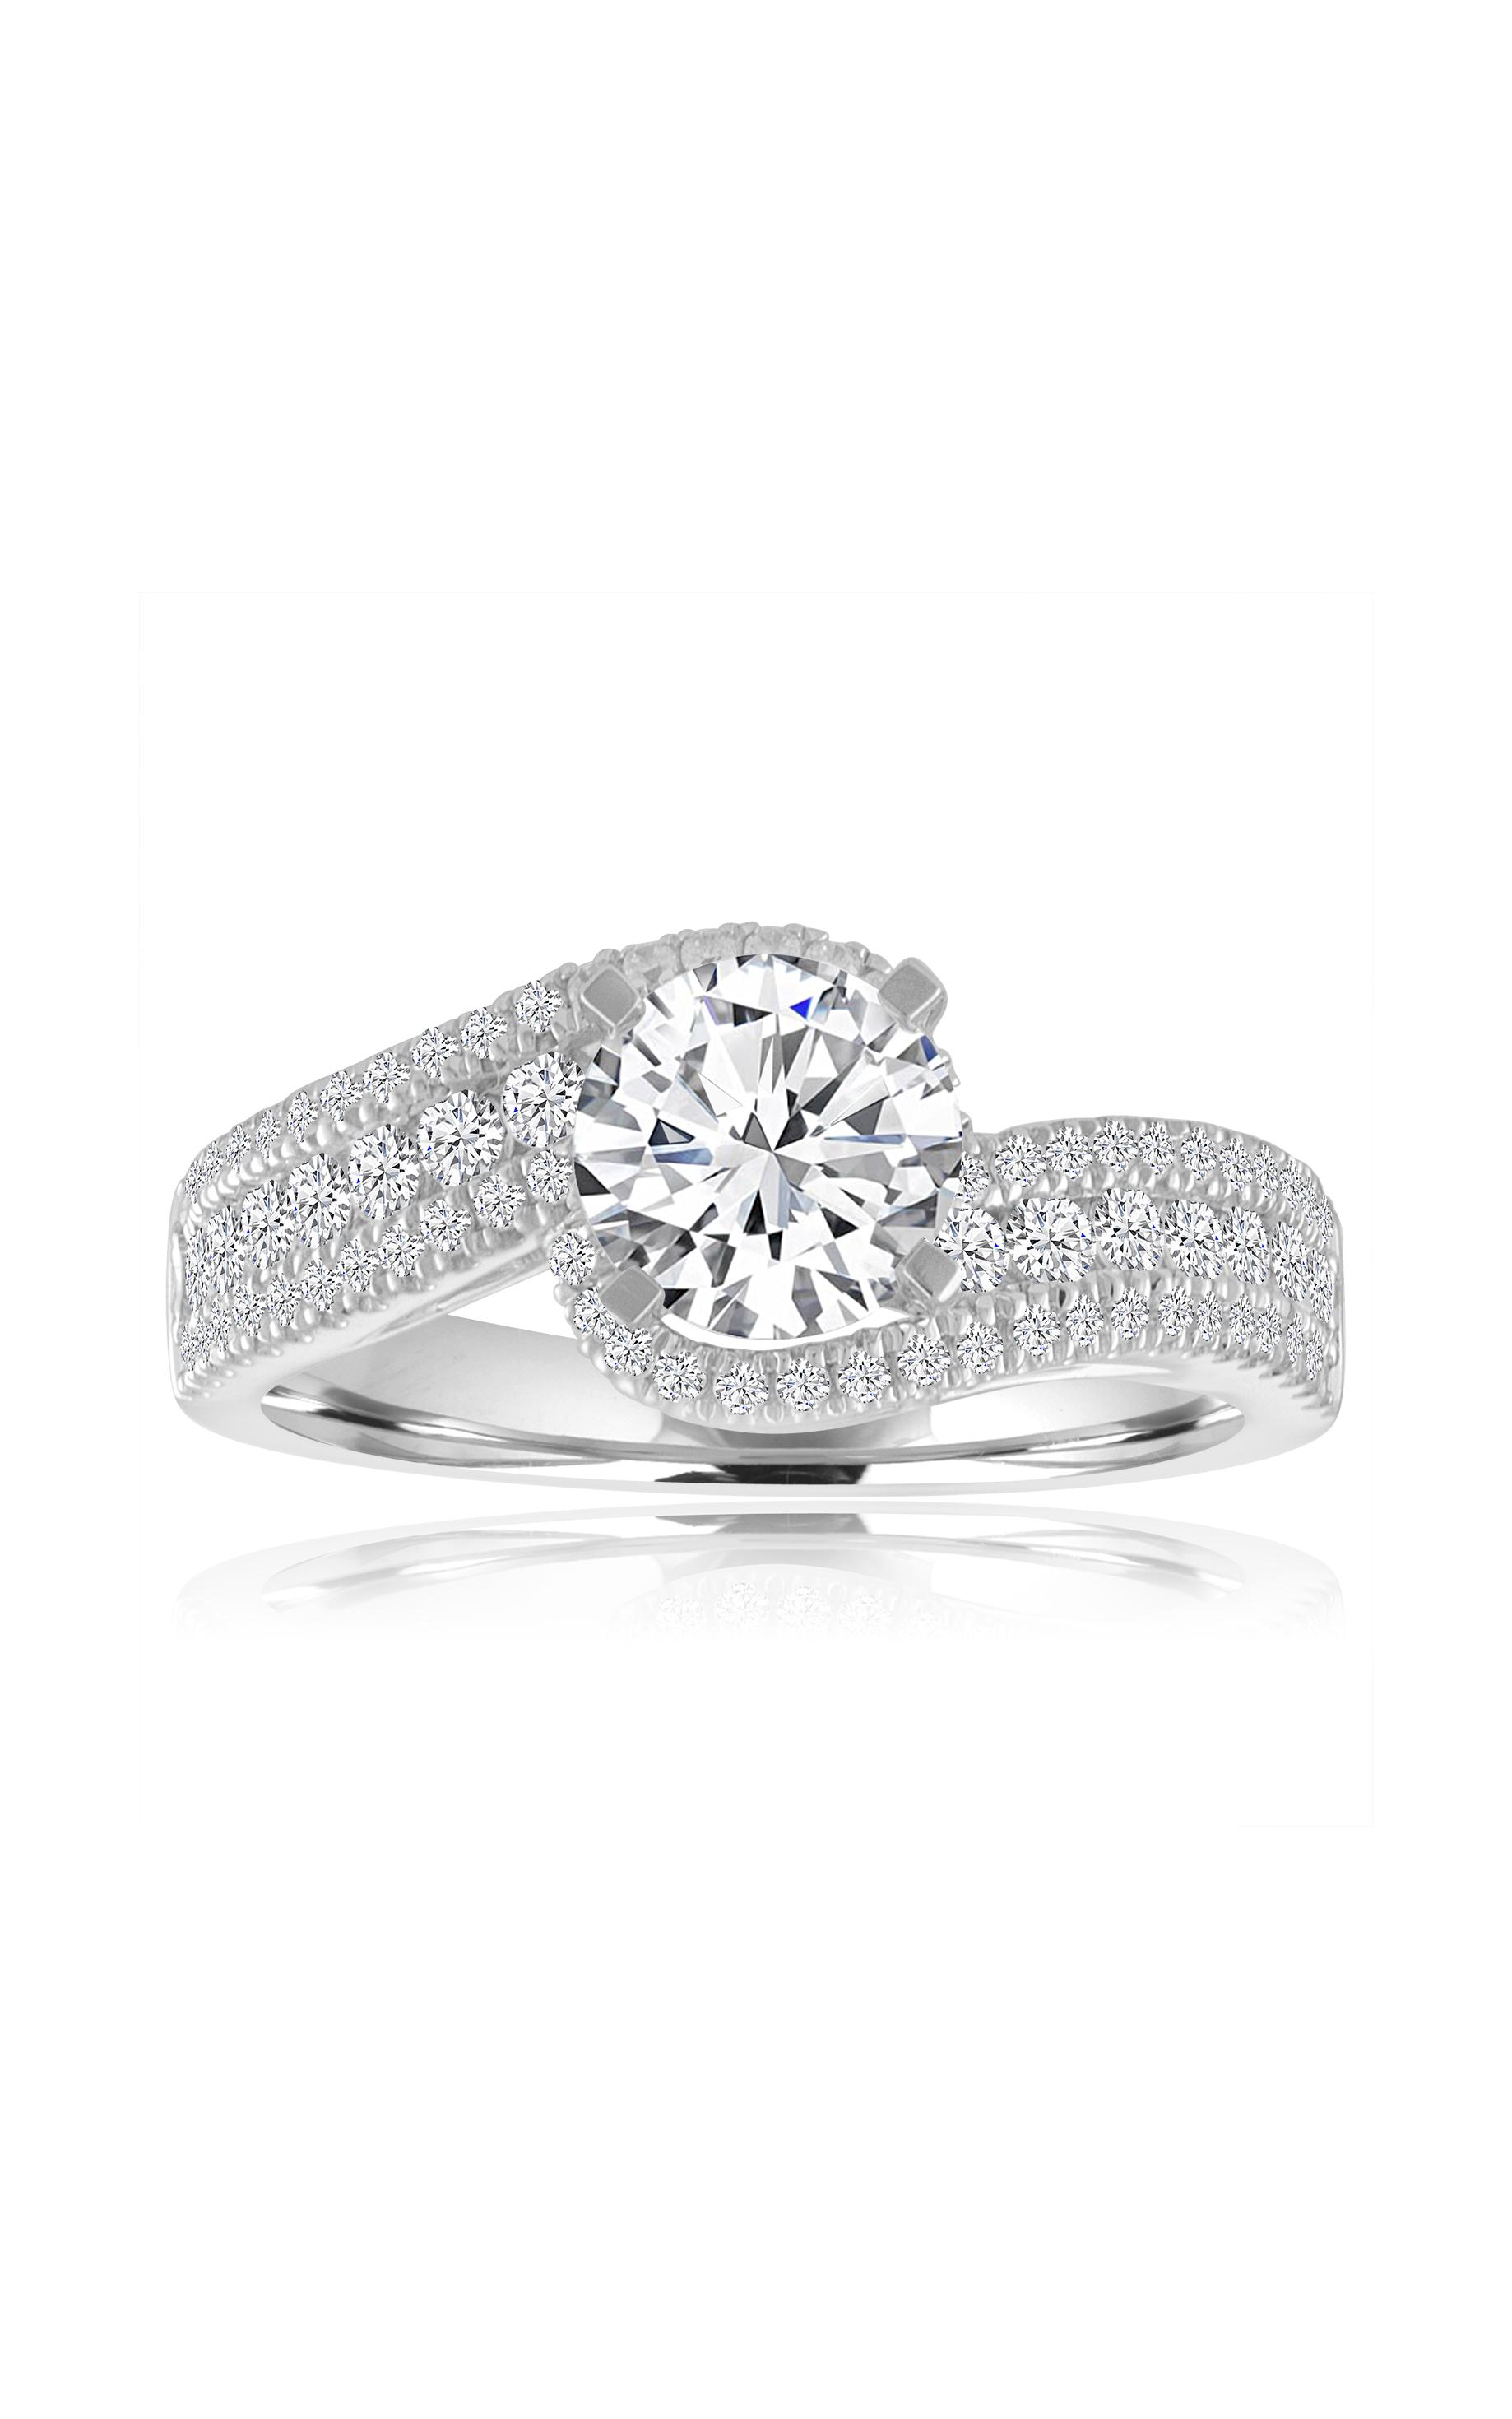 Imagine Bridal Engagement Rings 64236D-1 6 product image